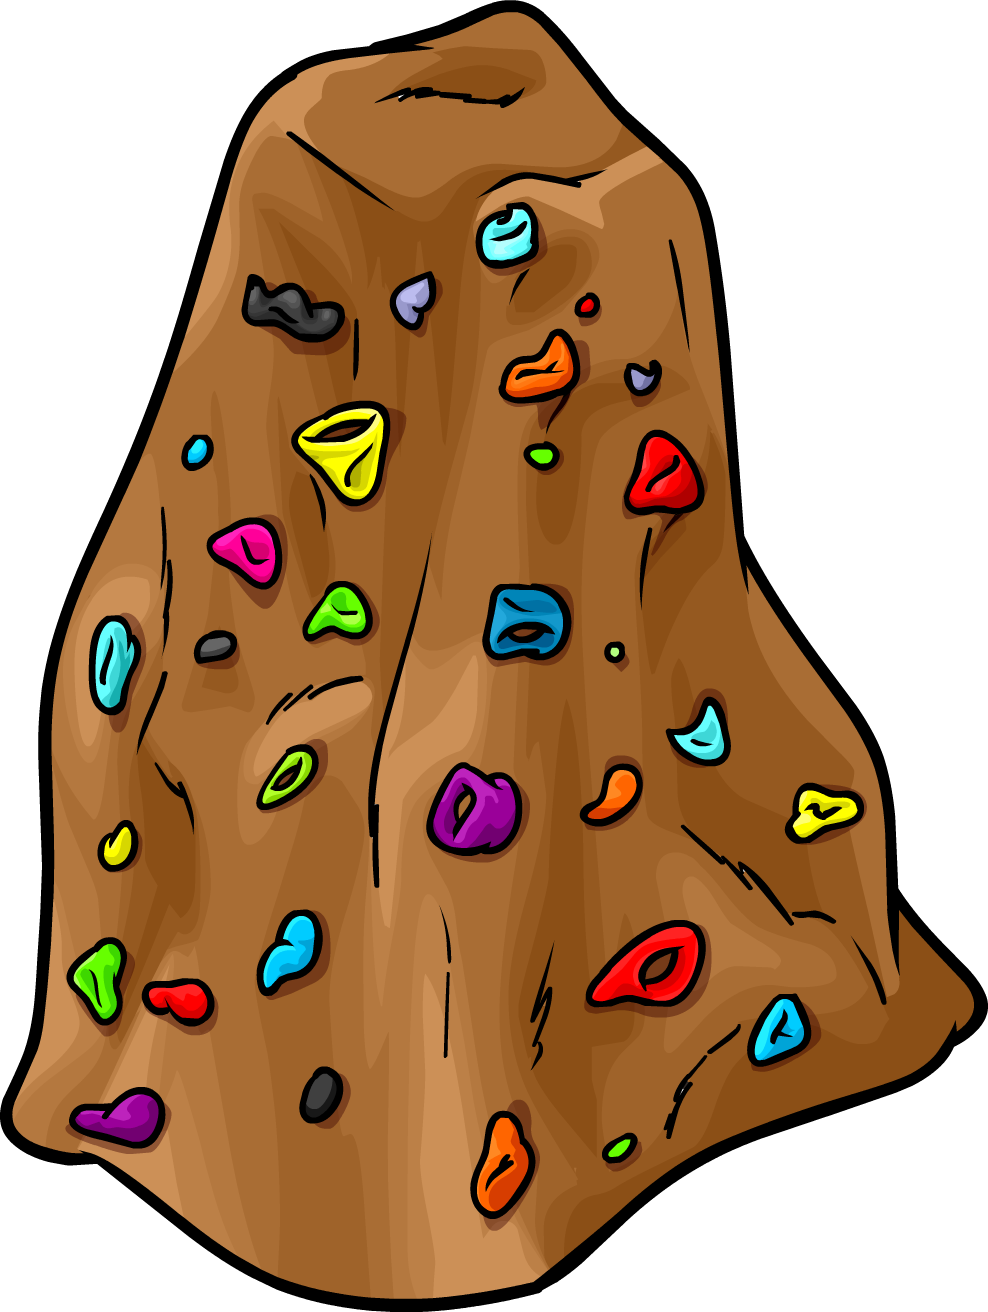 988x1312 Climbing Tree Clipart Climbing Wall